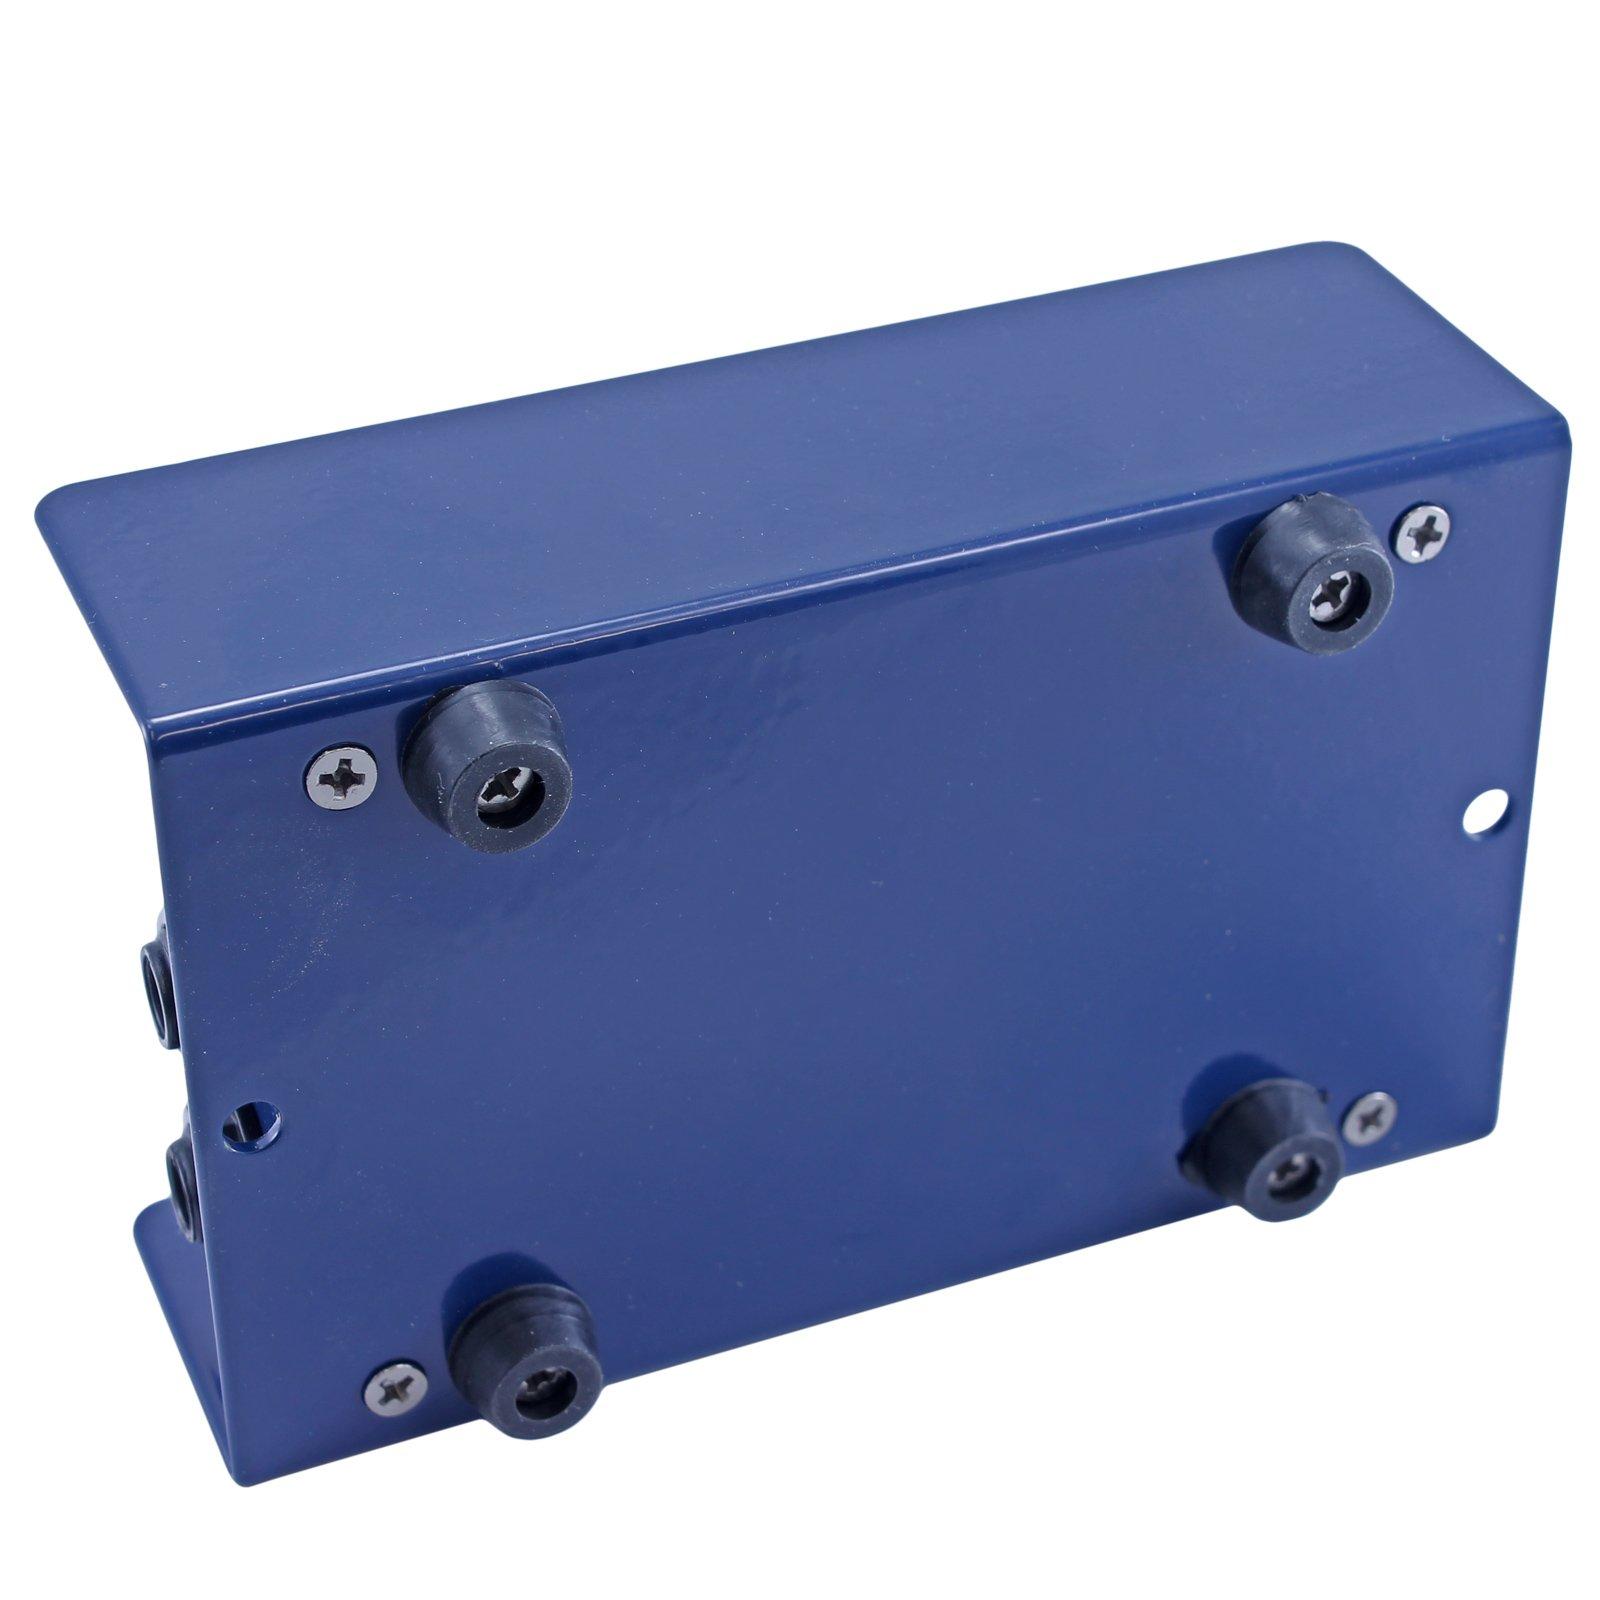 Passive Di direct box 1/4'' instrument to balanced & unbalanced XLR by Yovus (Image #5)